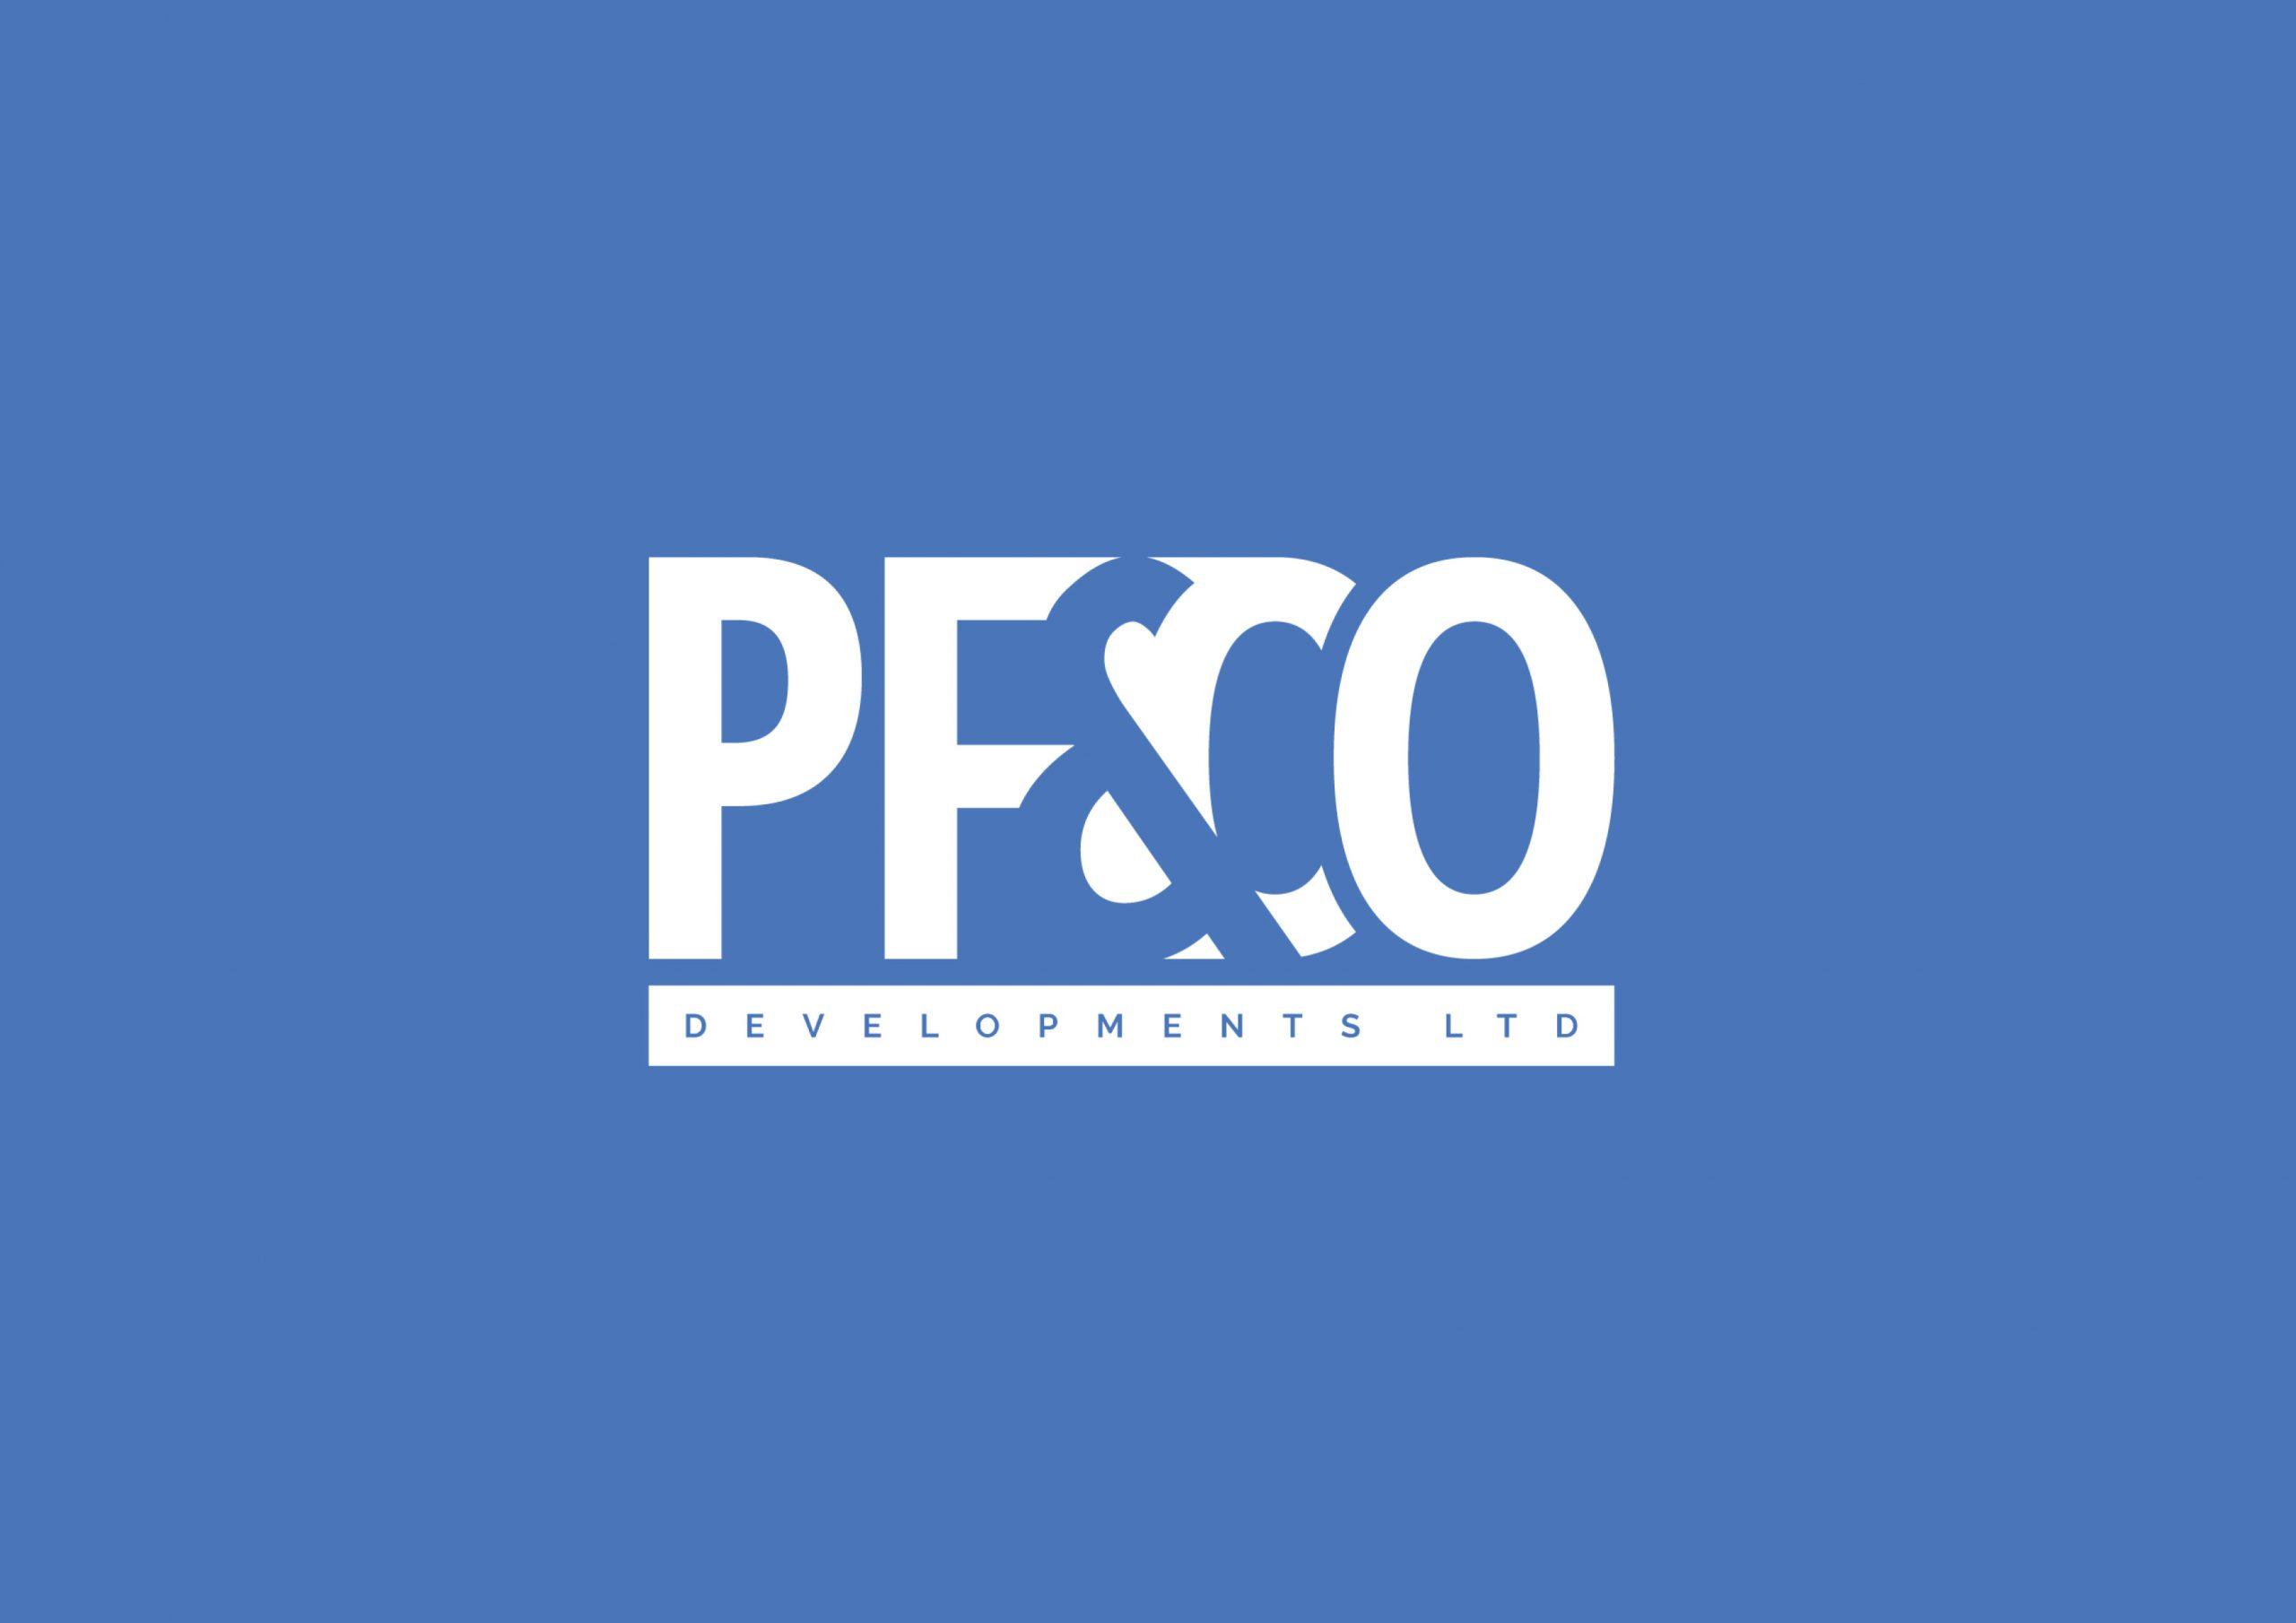 PF&Co Developments Logo Design & Branding